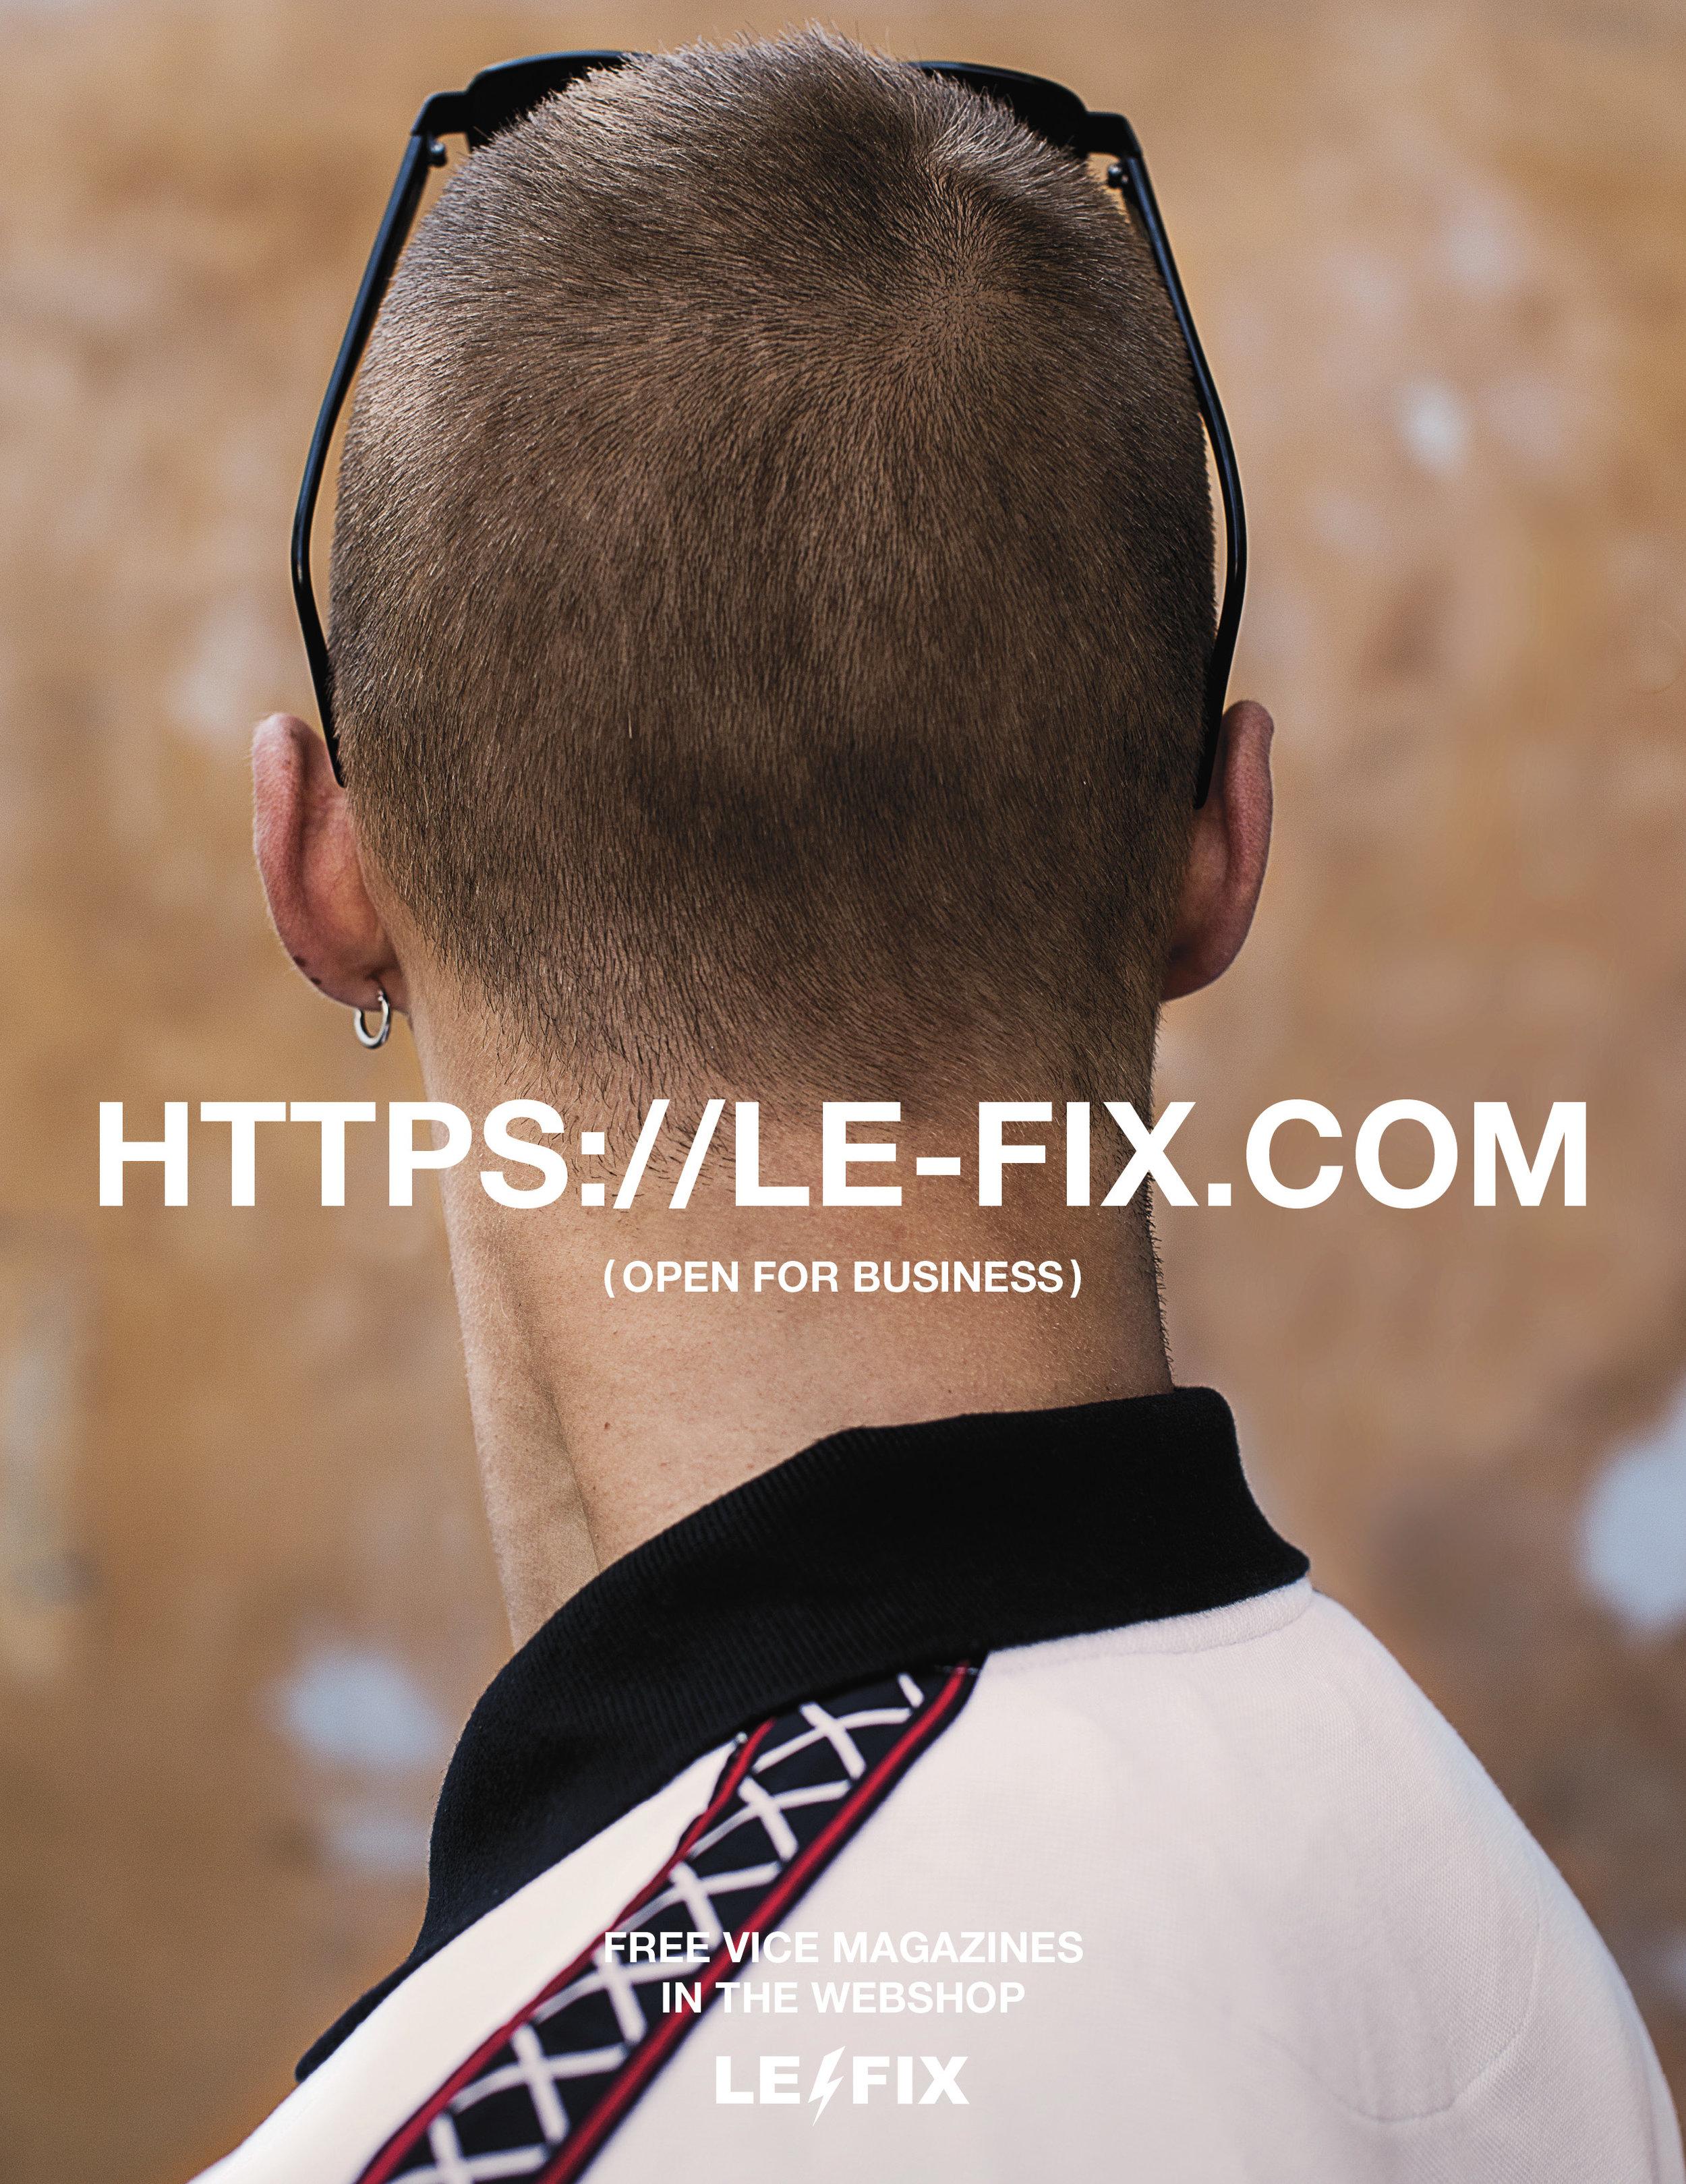 VICE_LE-FIX.jpg